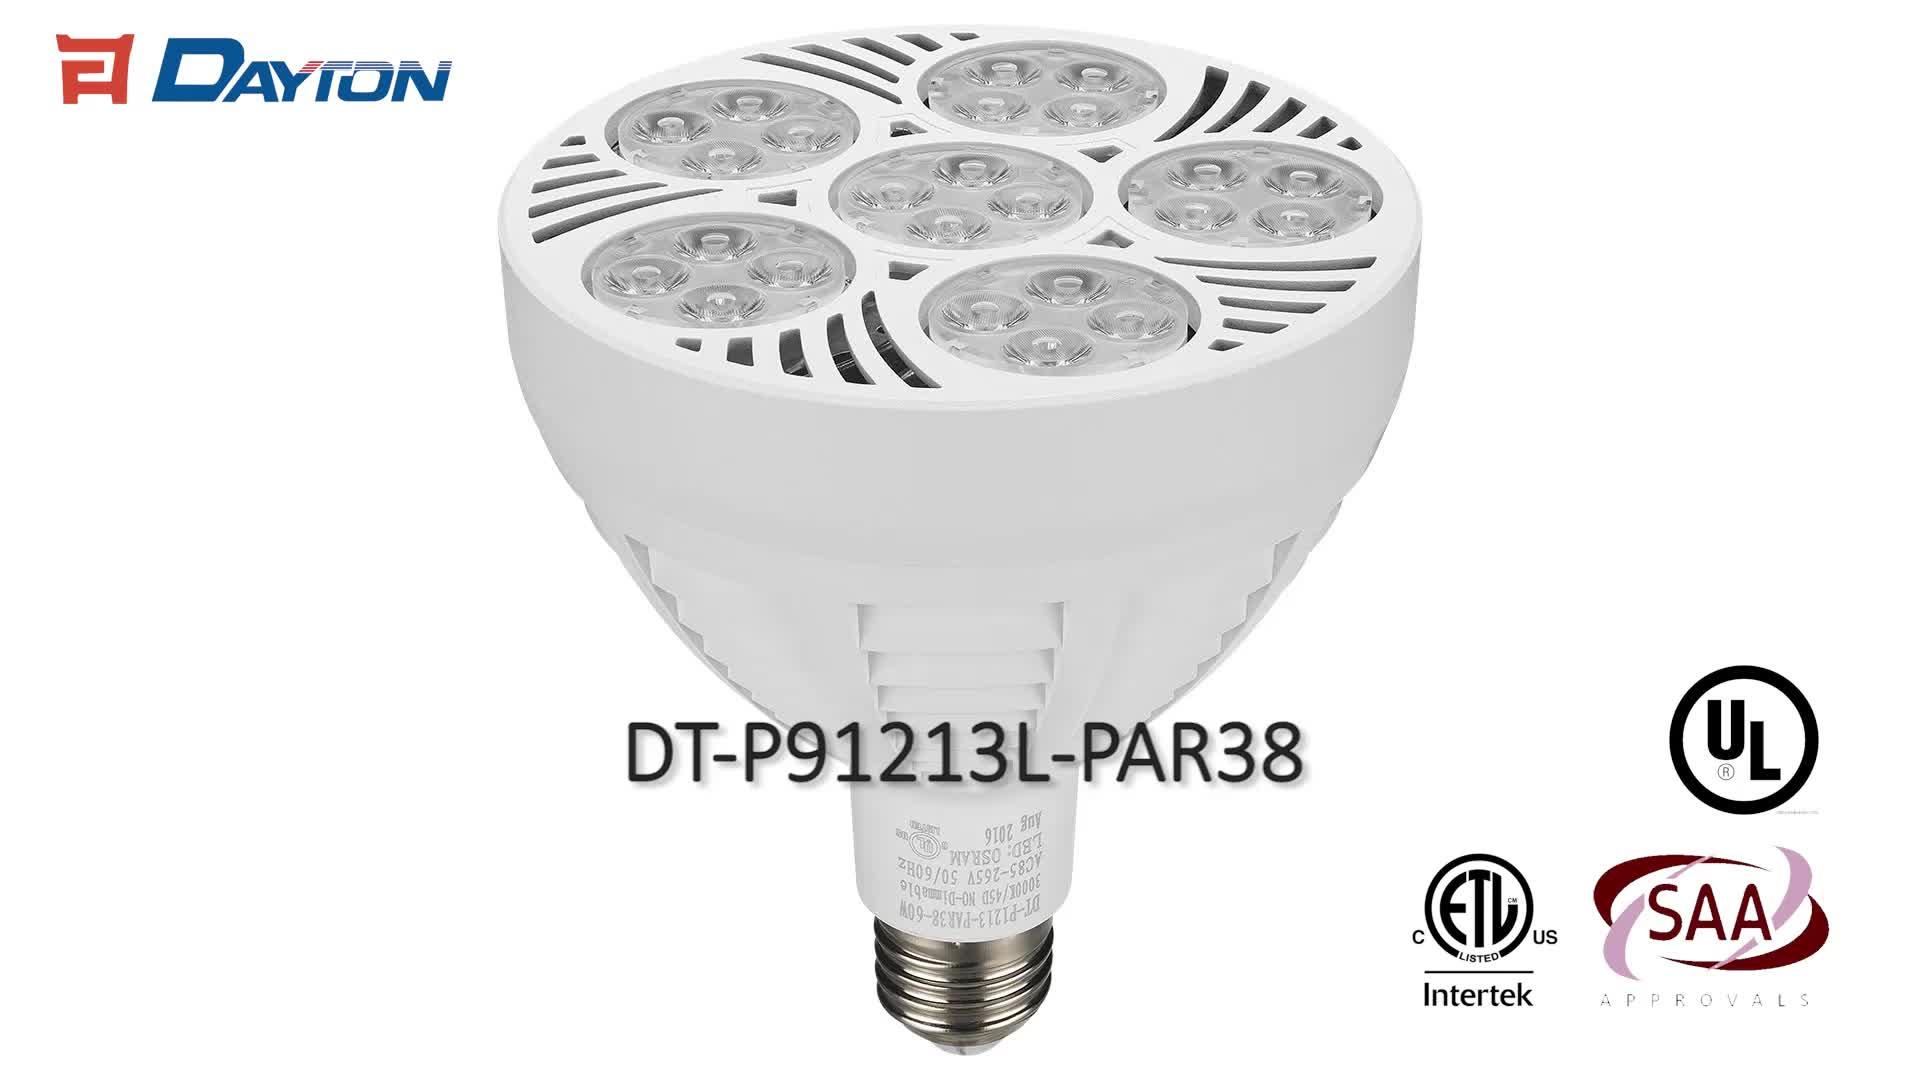 US Standard cETL ETL LED Bulb 60w PAR38 3000k 4000k 6000k 7000k 8000k 10000k Jewelry LED spotlight PAR38